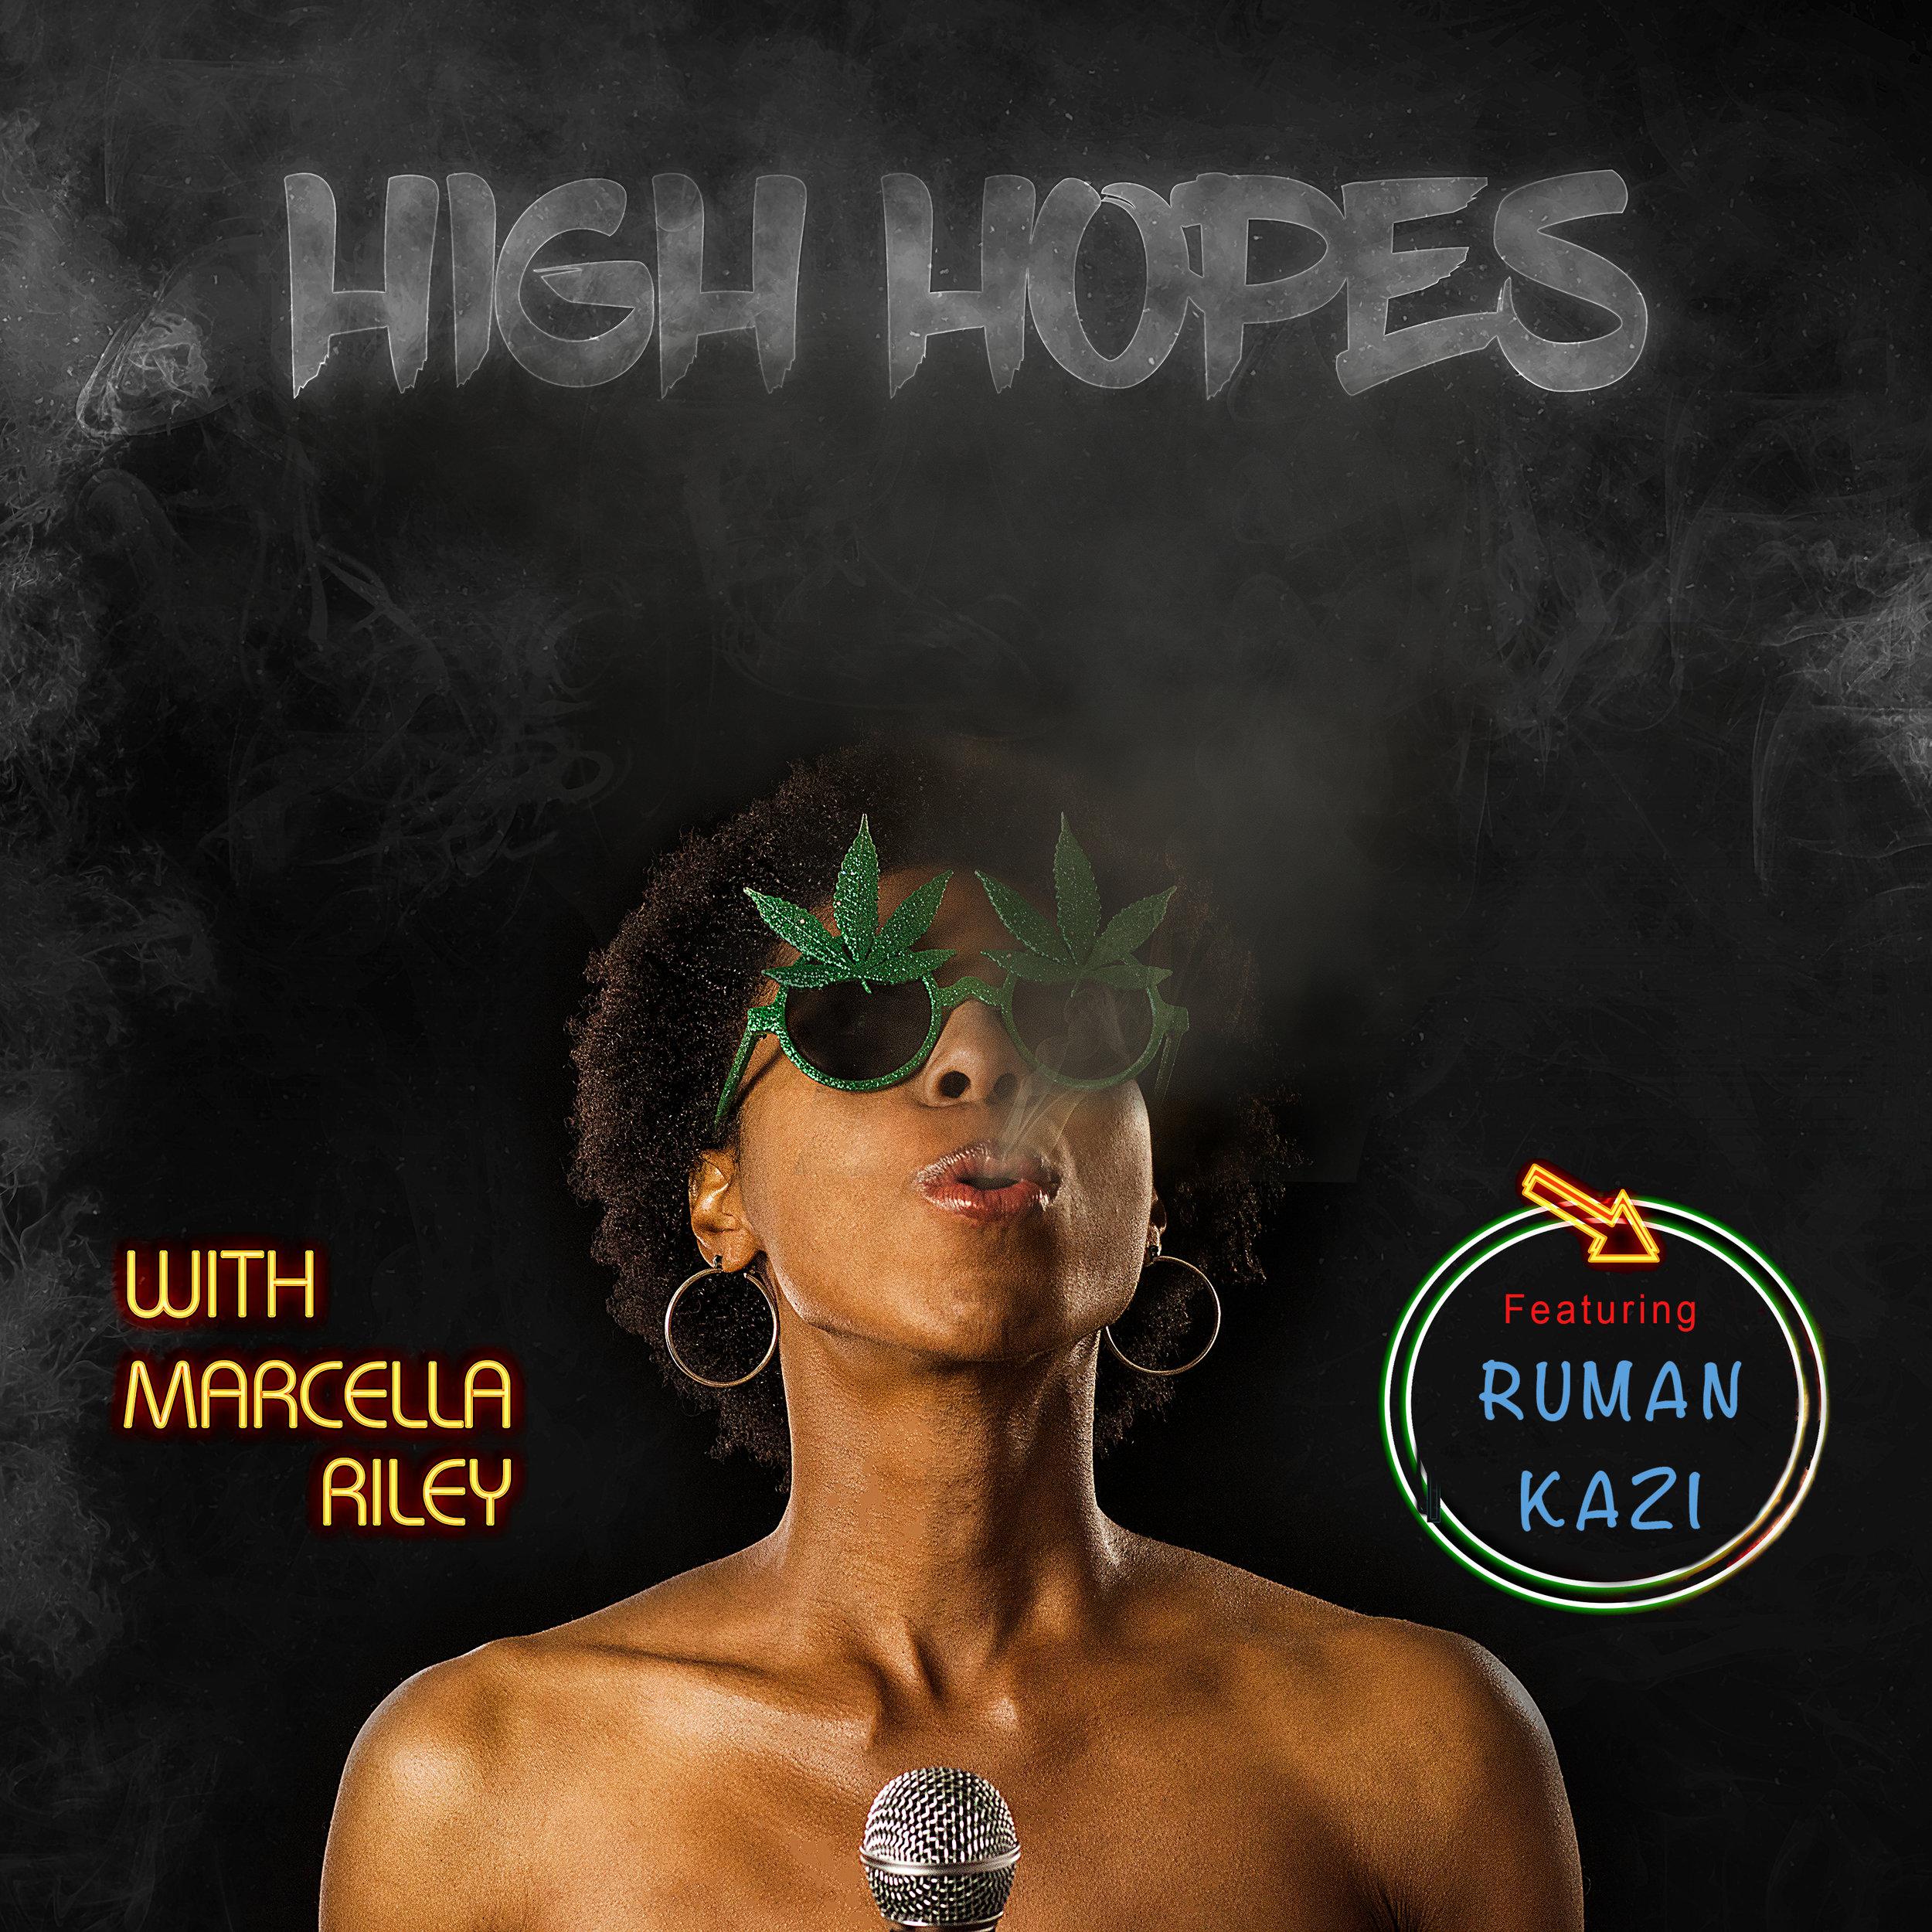 high_hopes-Ruman Kazi.jpg